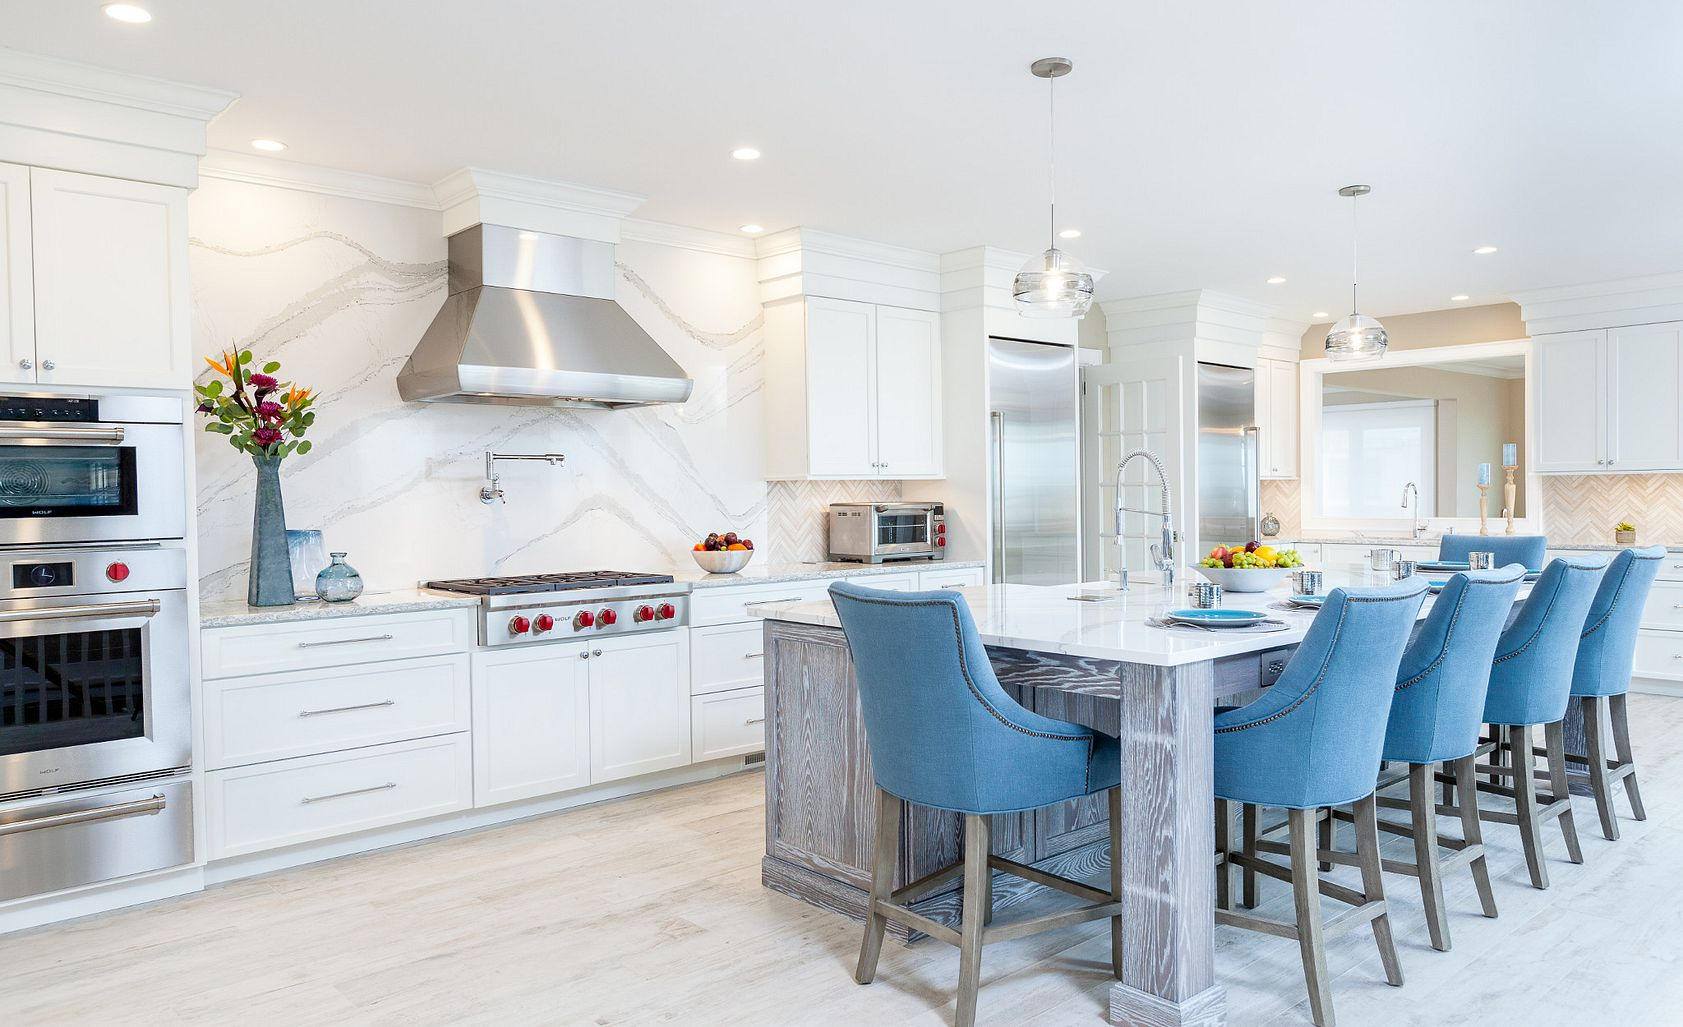 Cambria Brittanicca kitchen island and backsplash with blue stools.